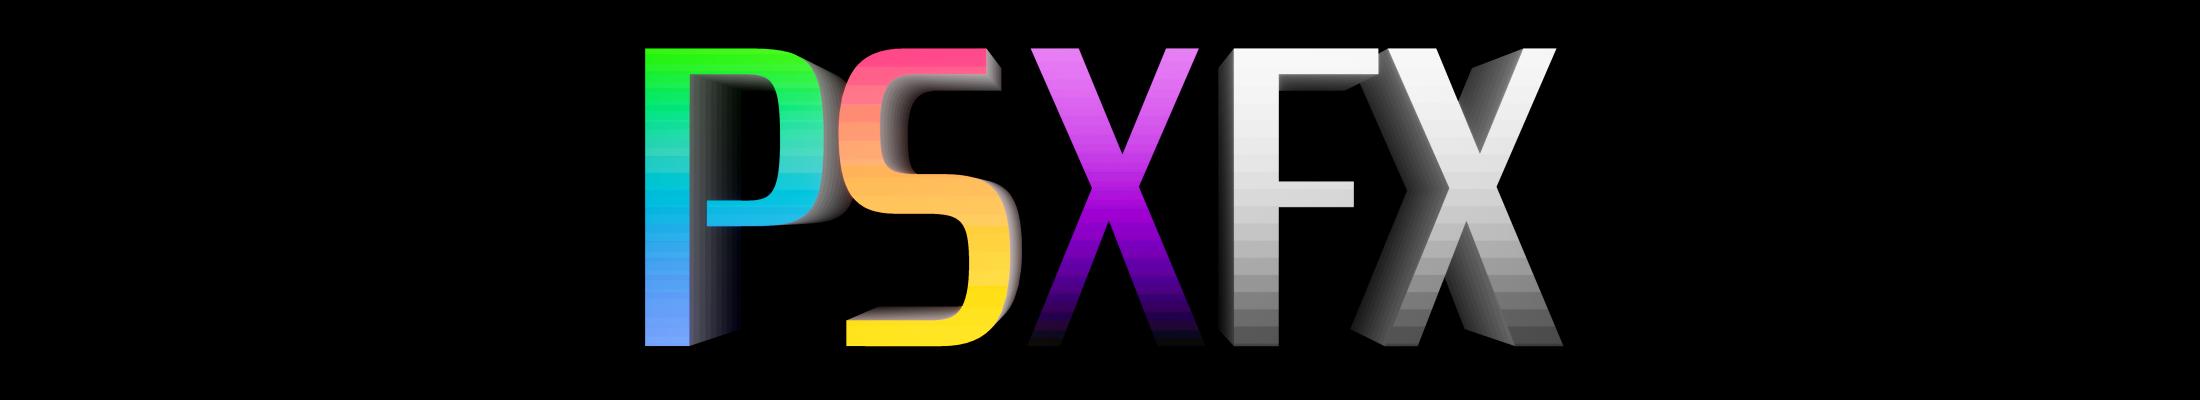 PSXFX - Retro Graphics for Unreal Engine 4